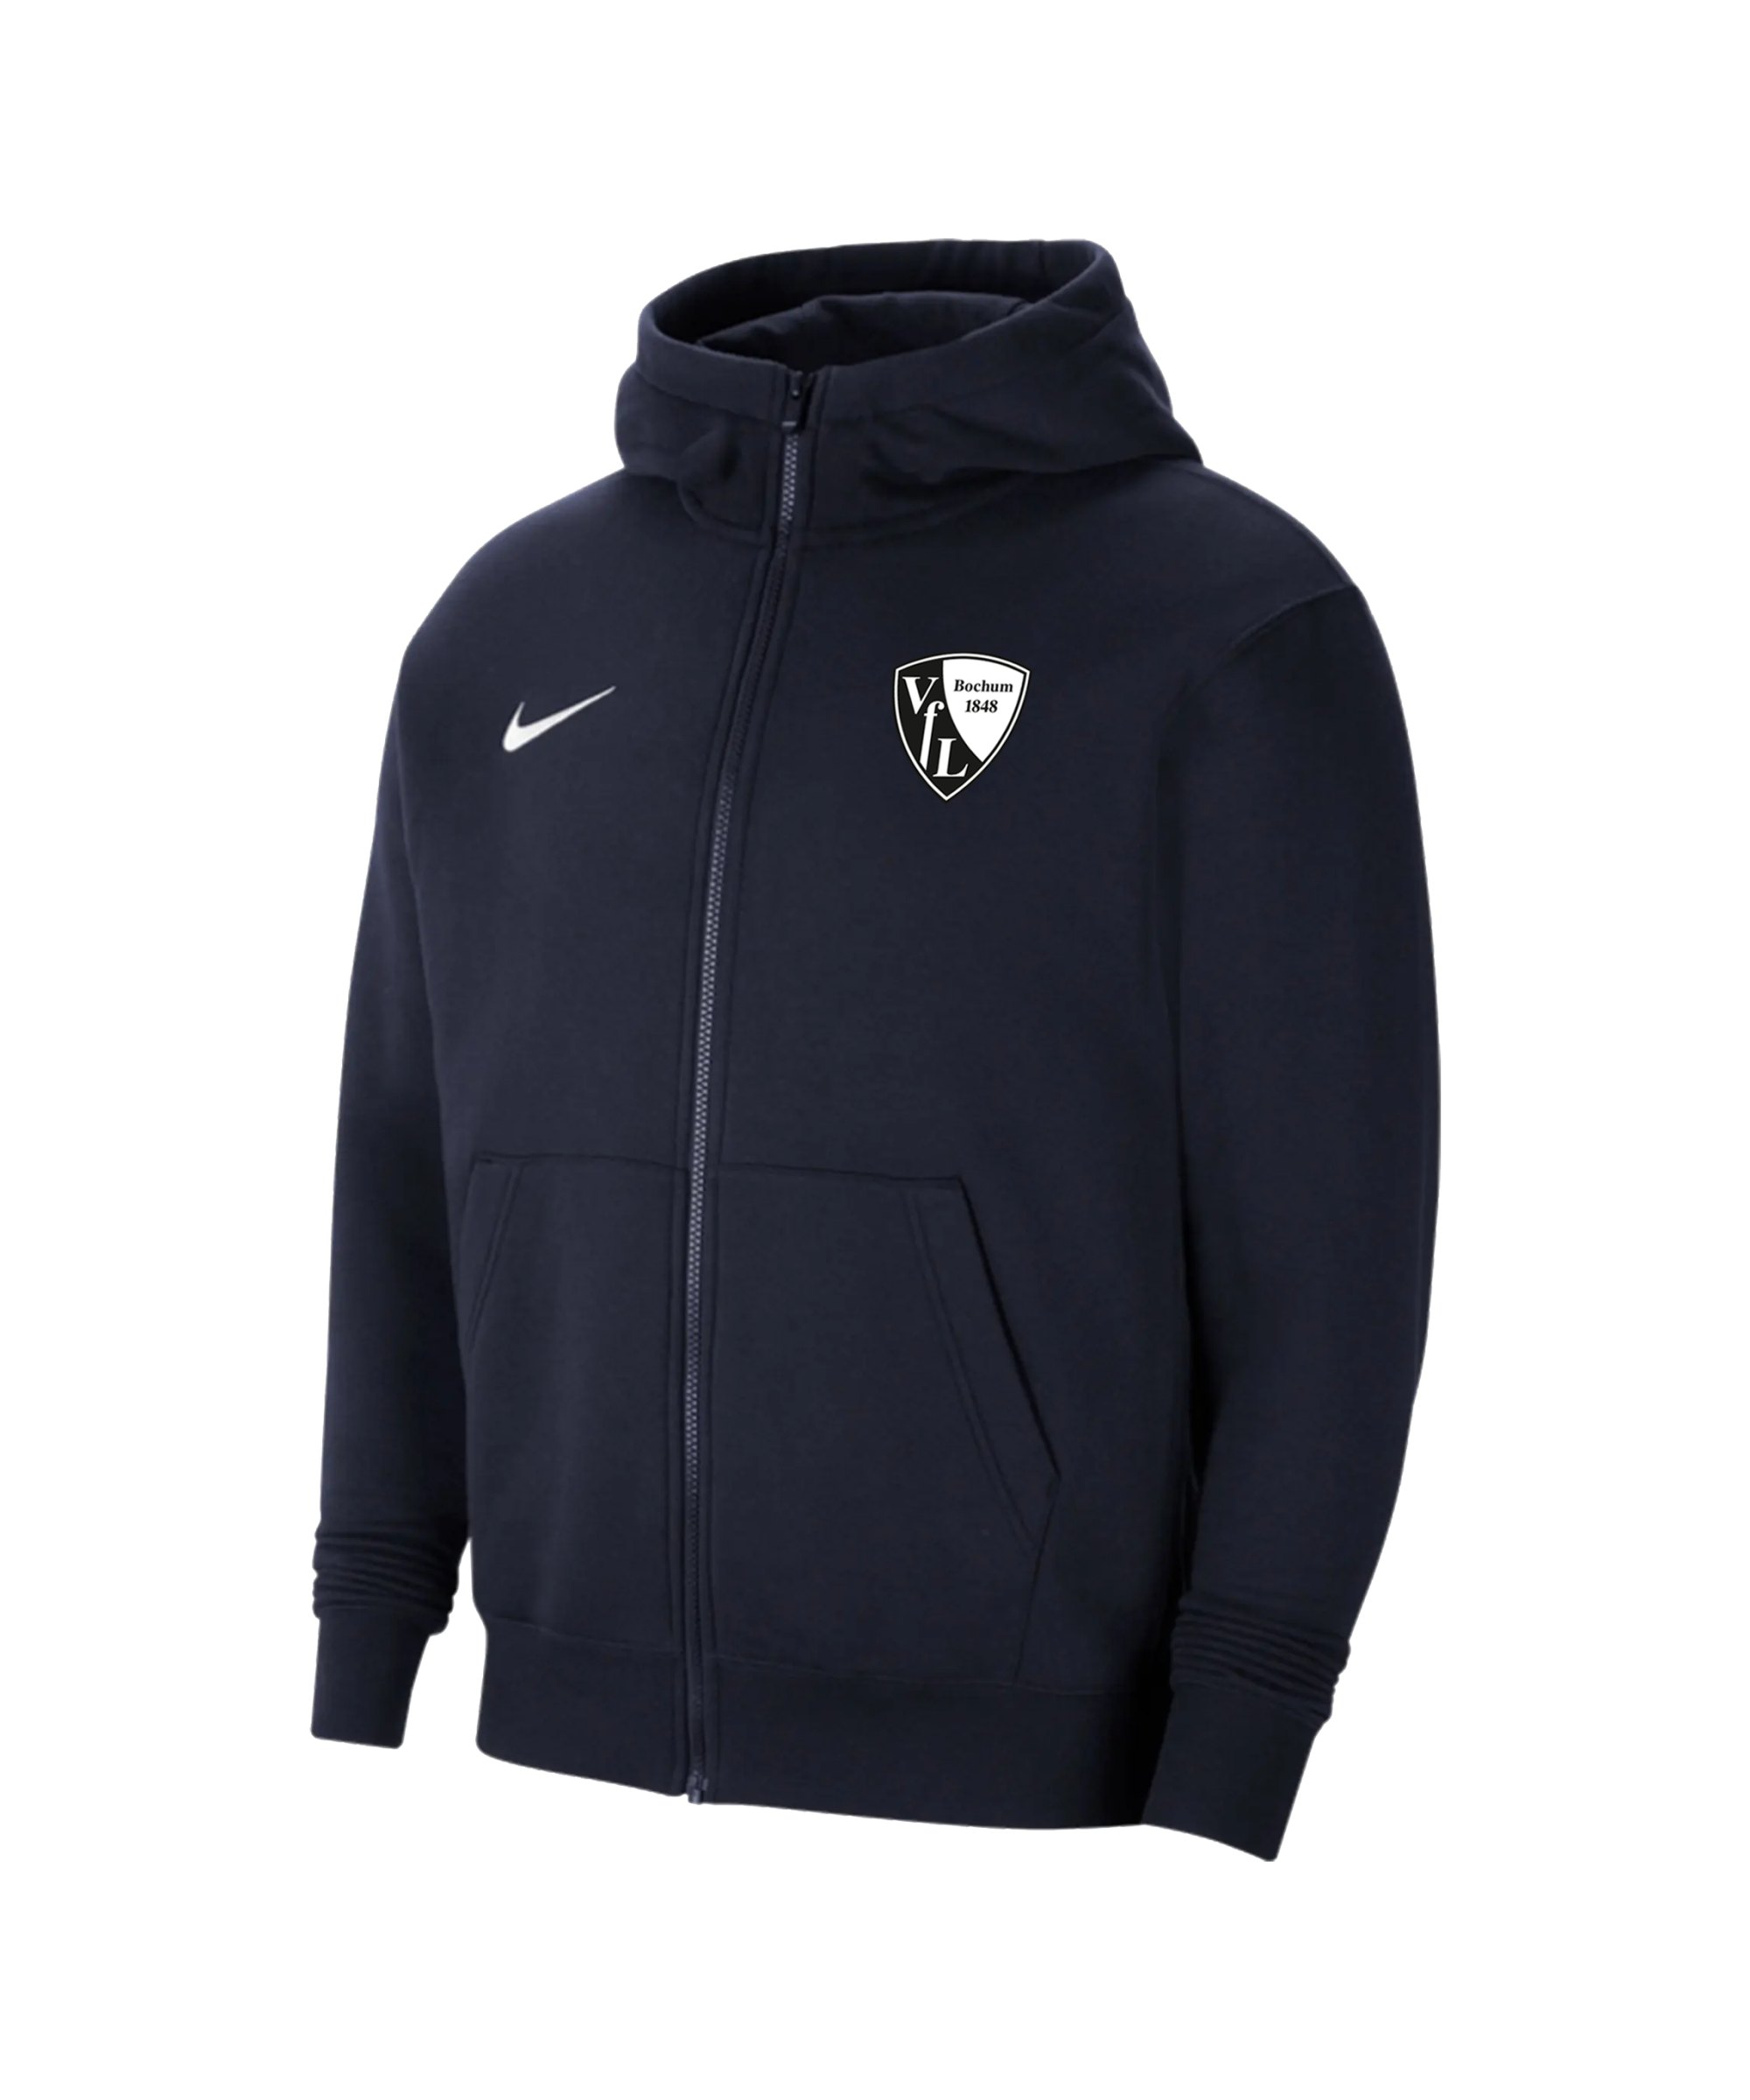 Nike VfL Bochum Kapuzenjacke Blau F451 - blau